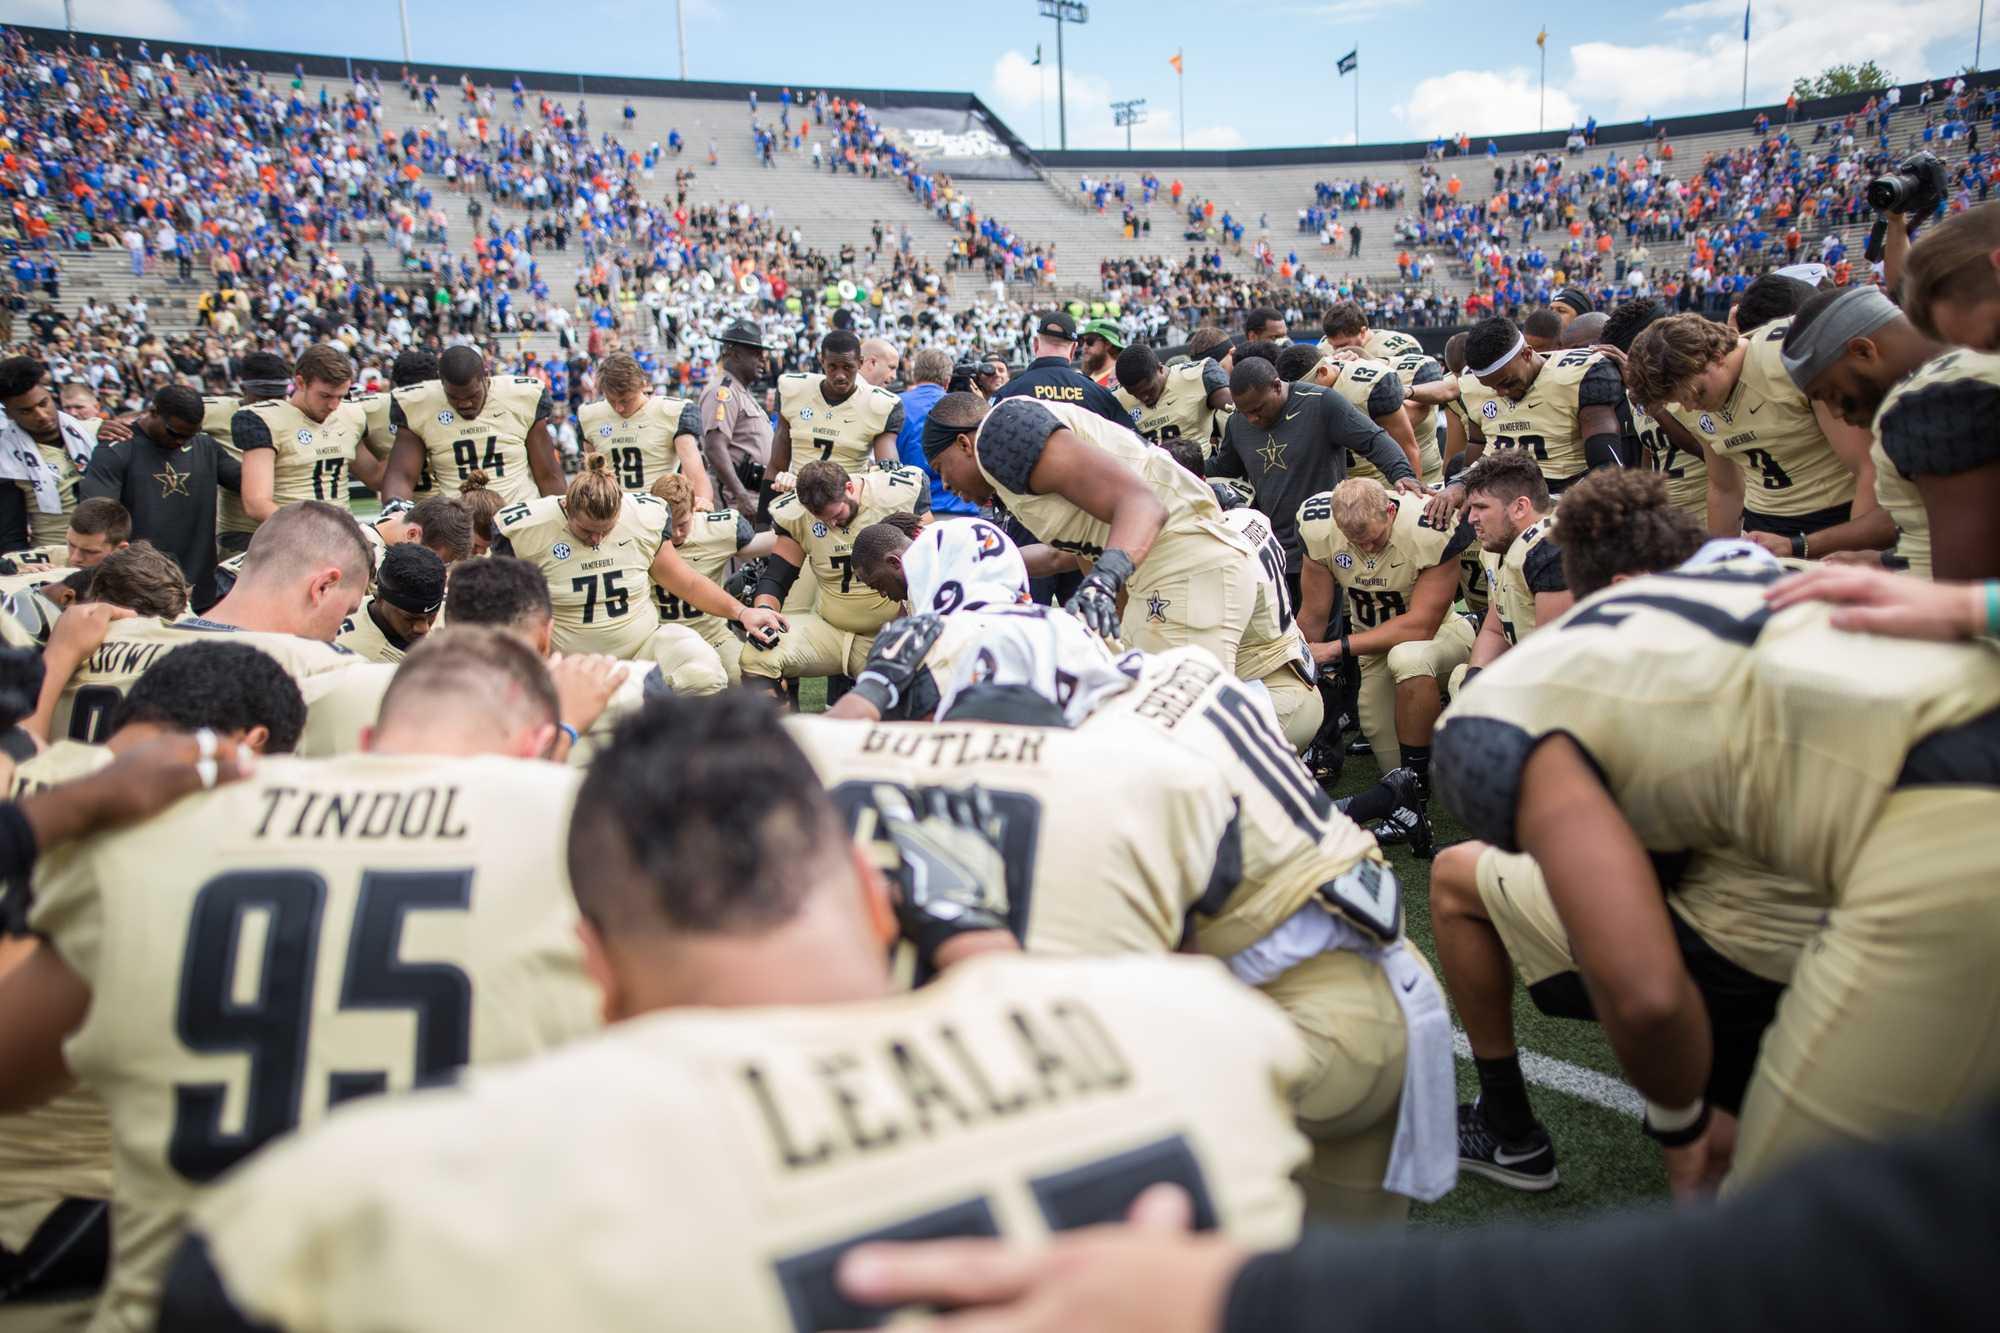 Team prayer as the Florida Gators defeated Vanderbilt 13-6 October 1, 2016 at Vanderbilt Stadium. (Ziyi Liu)